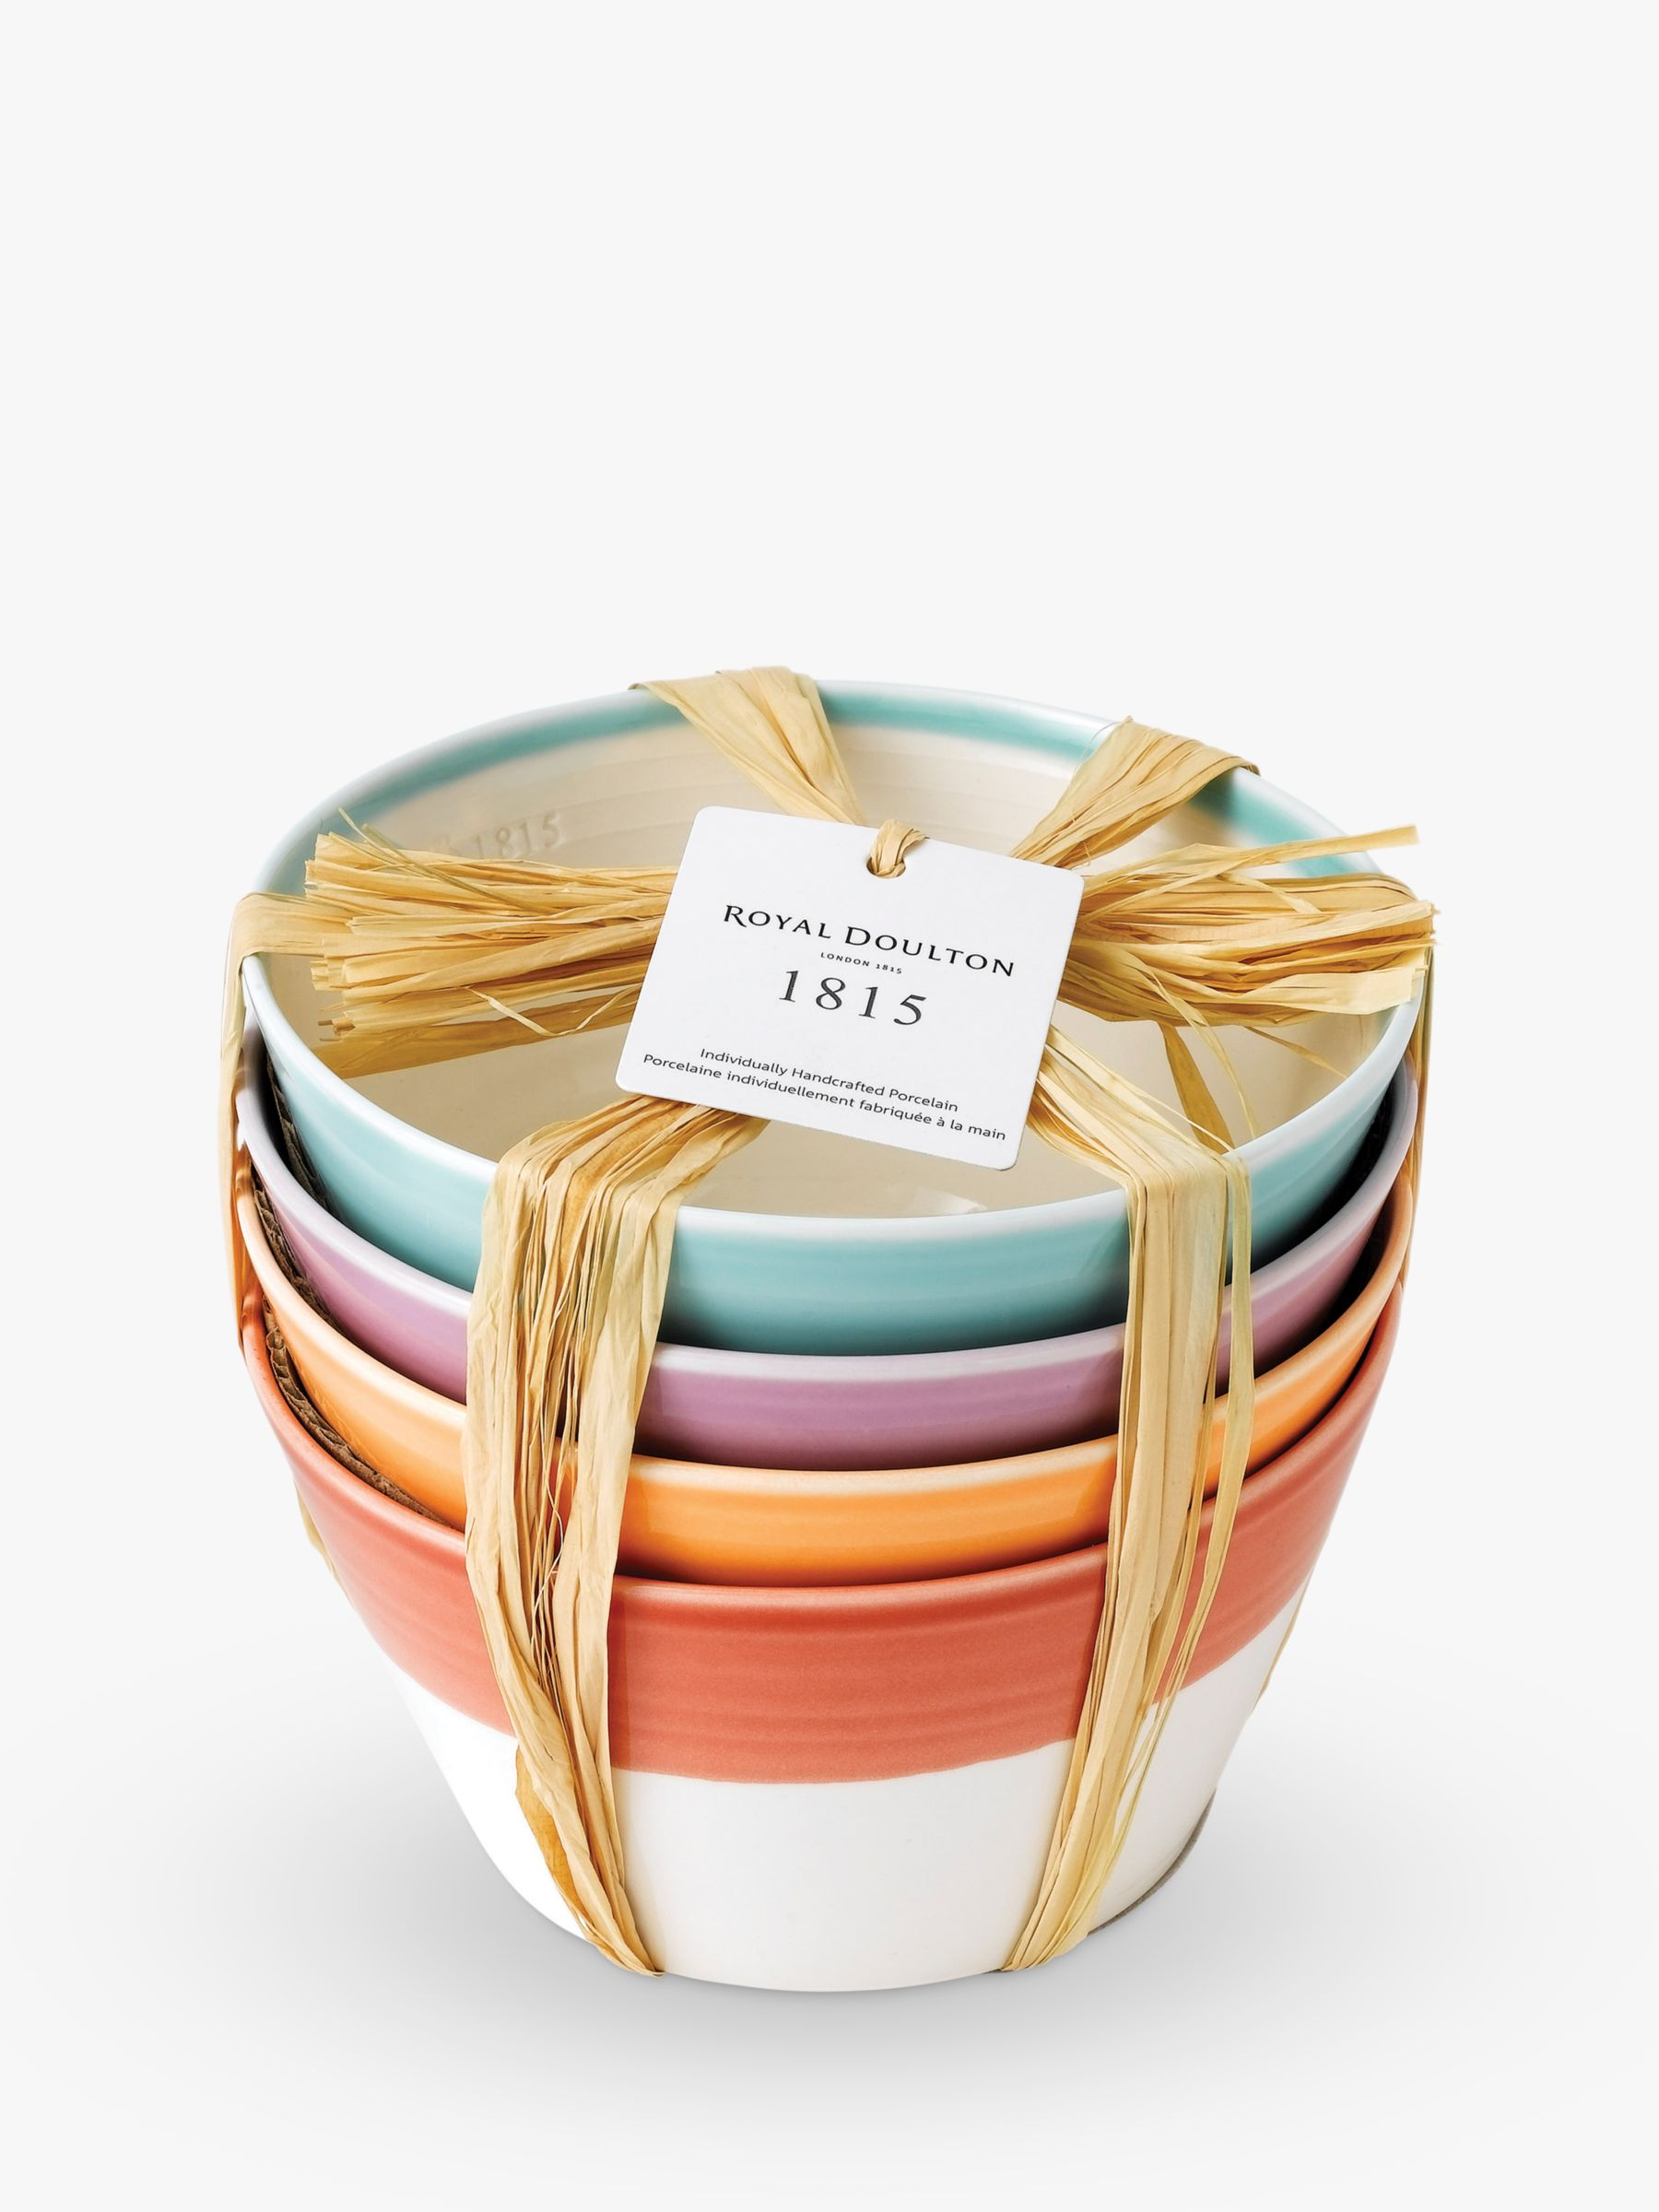 Royal Doulton Royal Doulton 1815 Cereal Bowl, Multi, Set Of 4